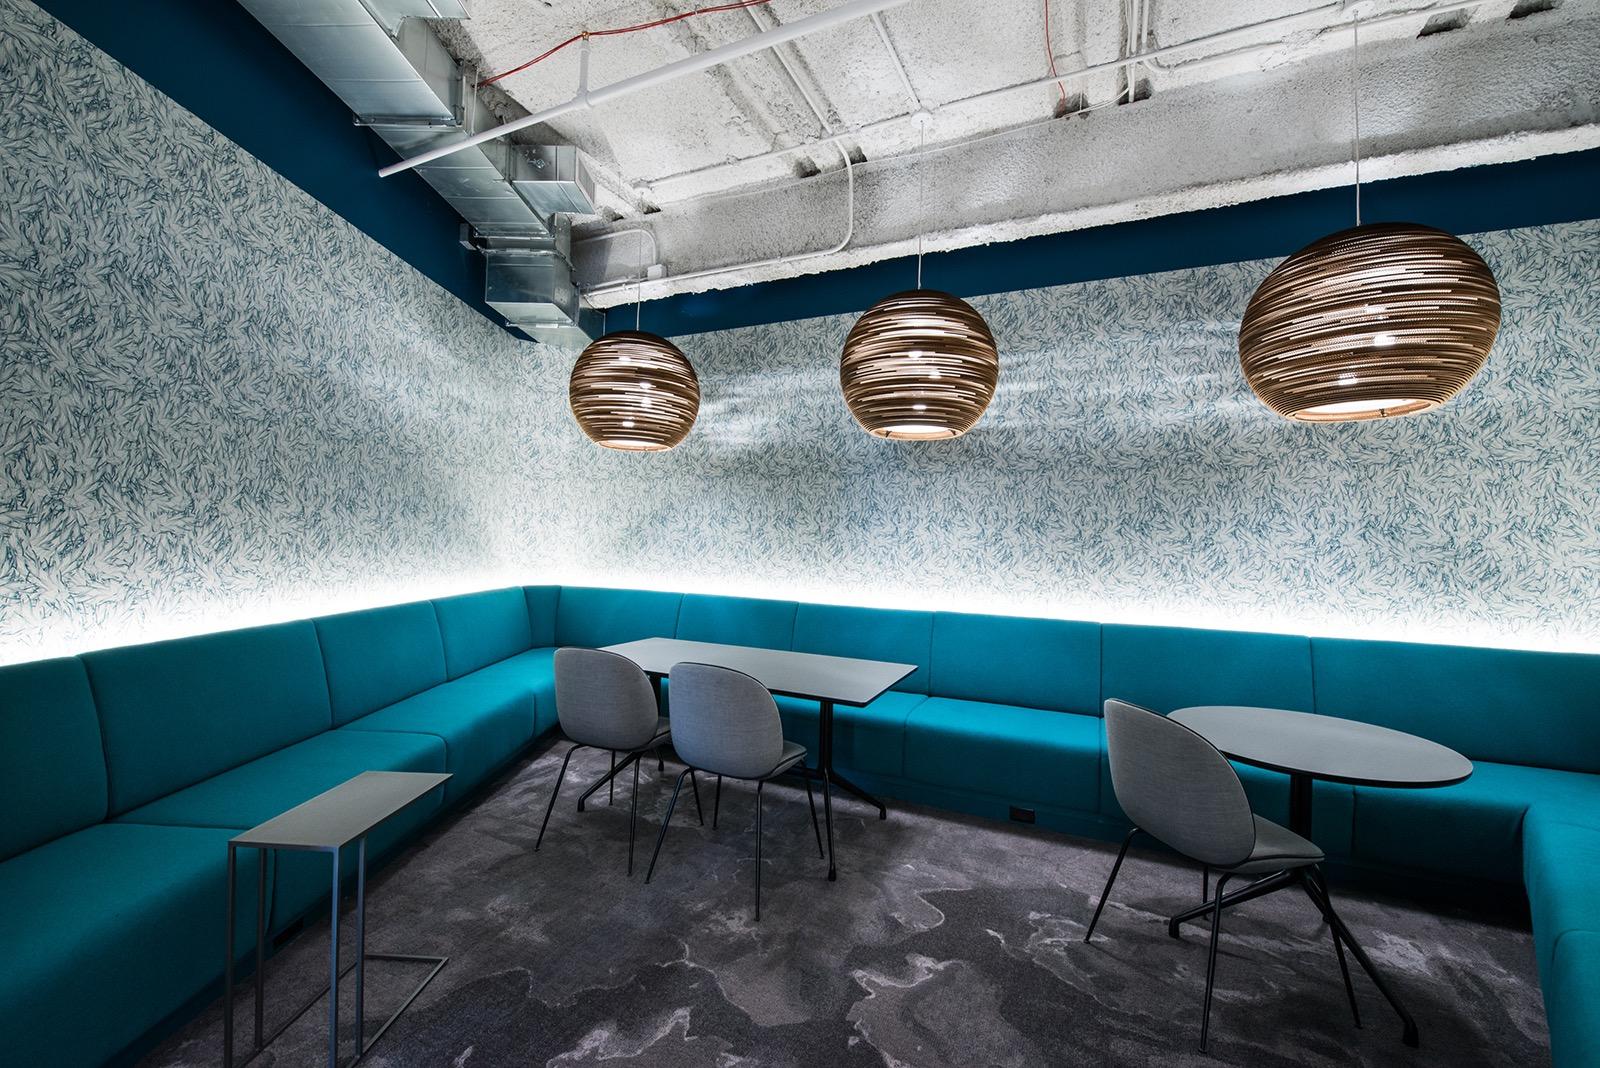 vox-media-nyc-office-10